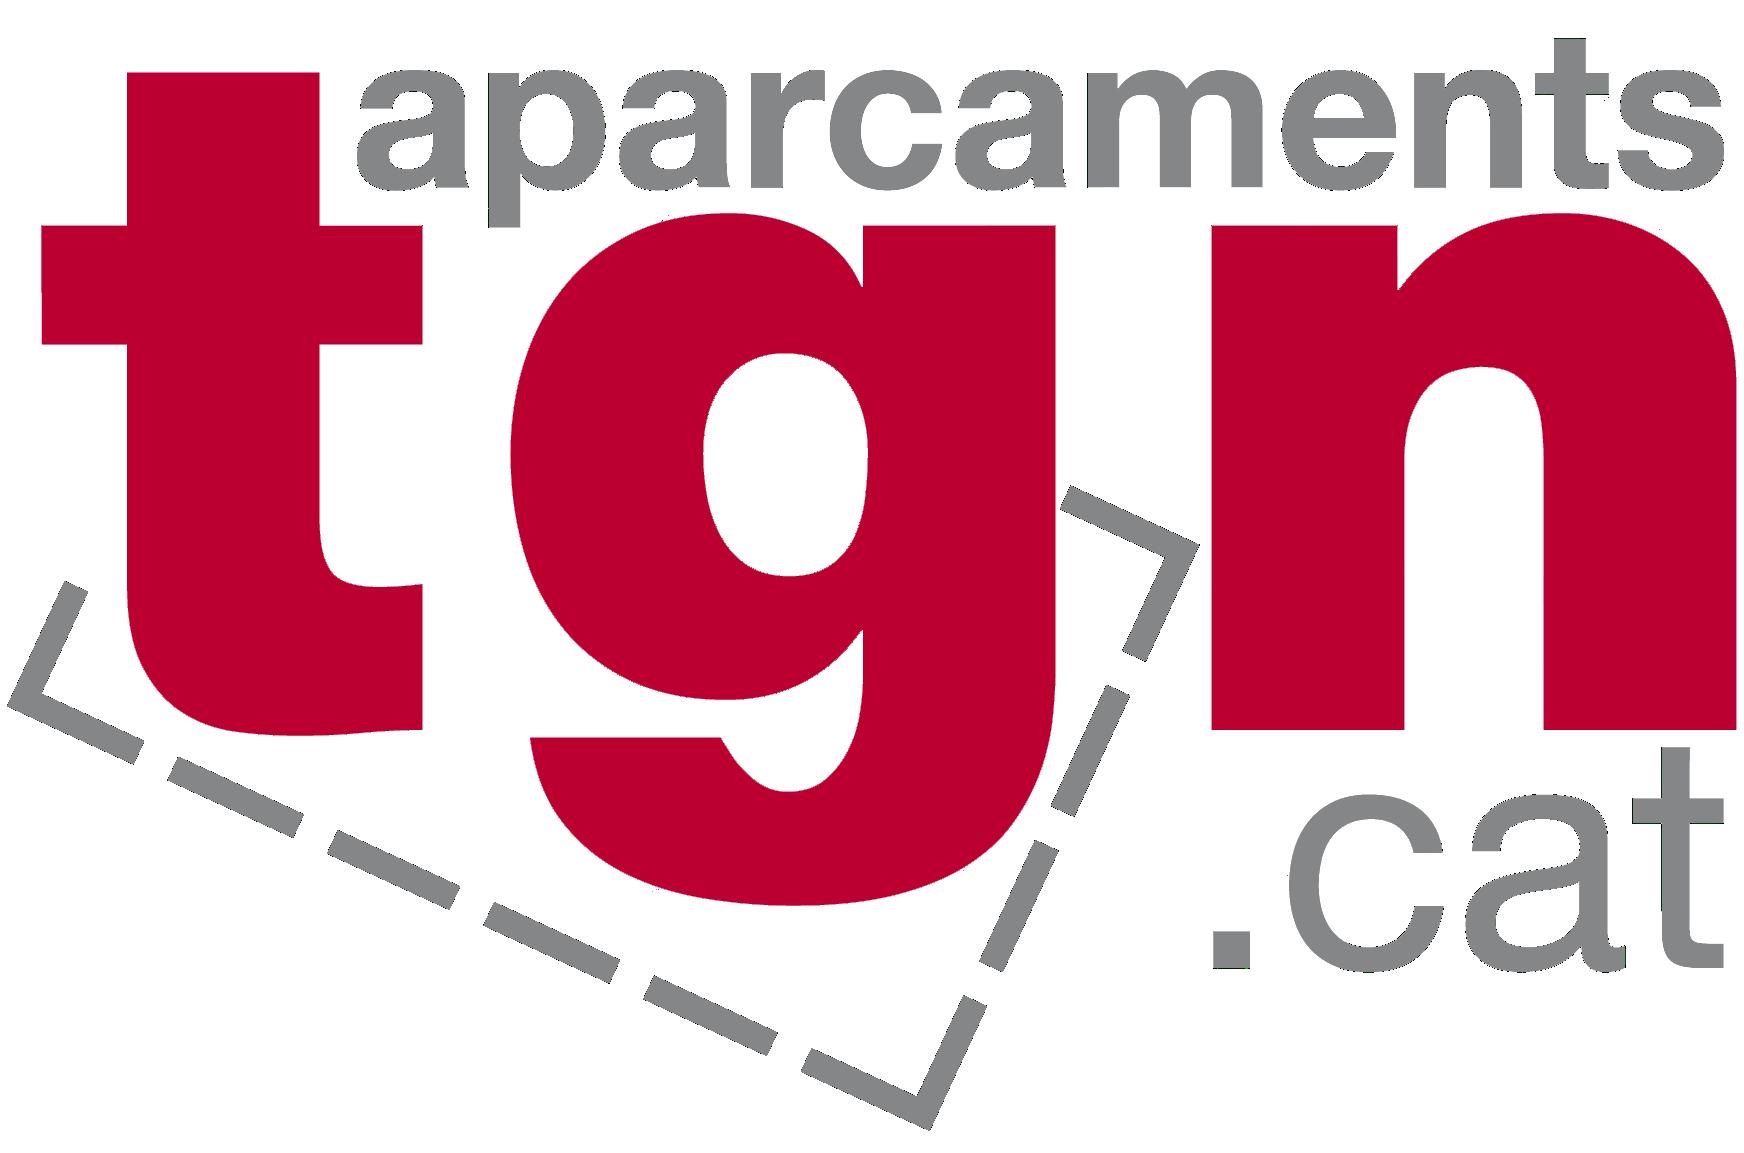 Logo comerç Aparcament Avinguda Catalunya